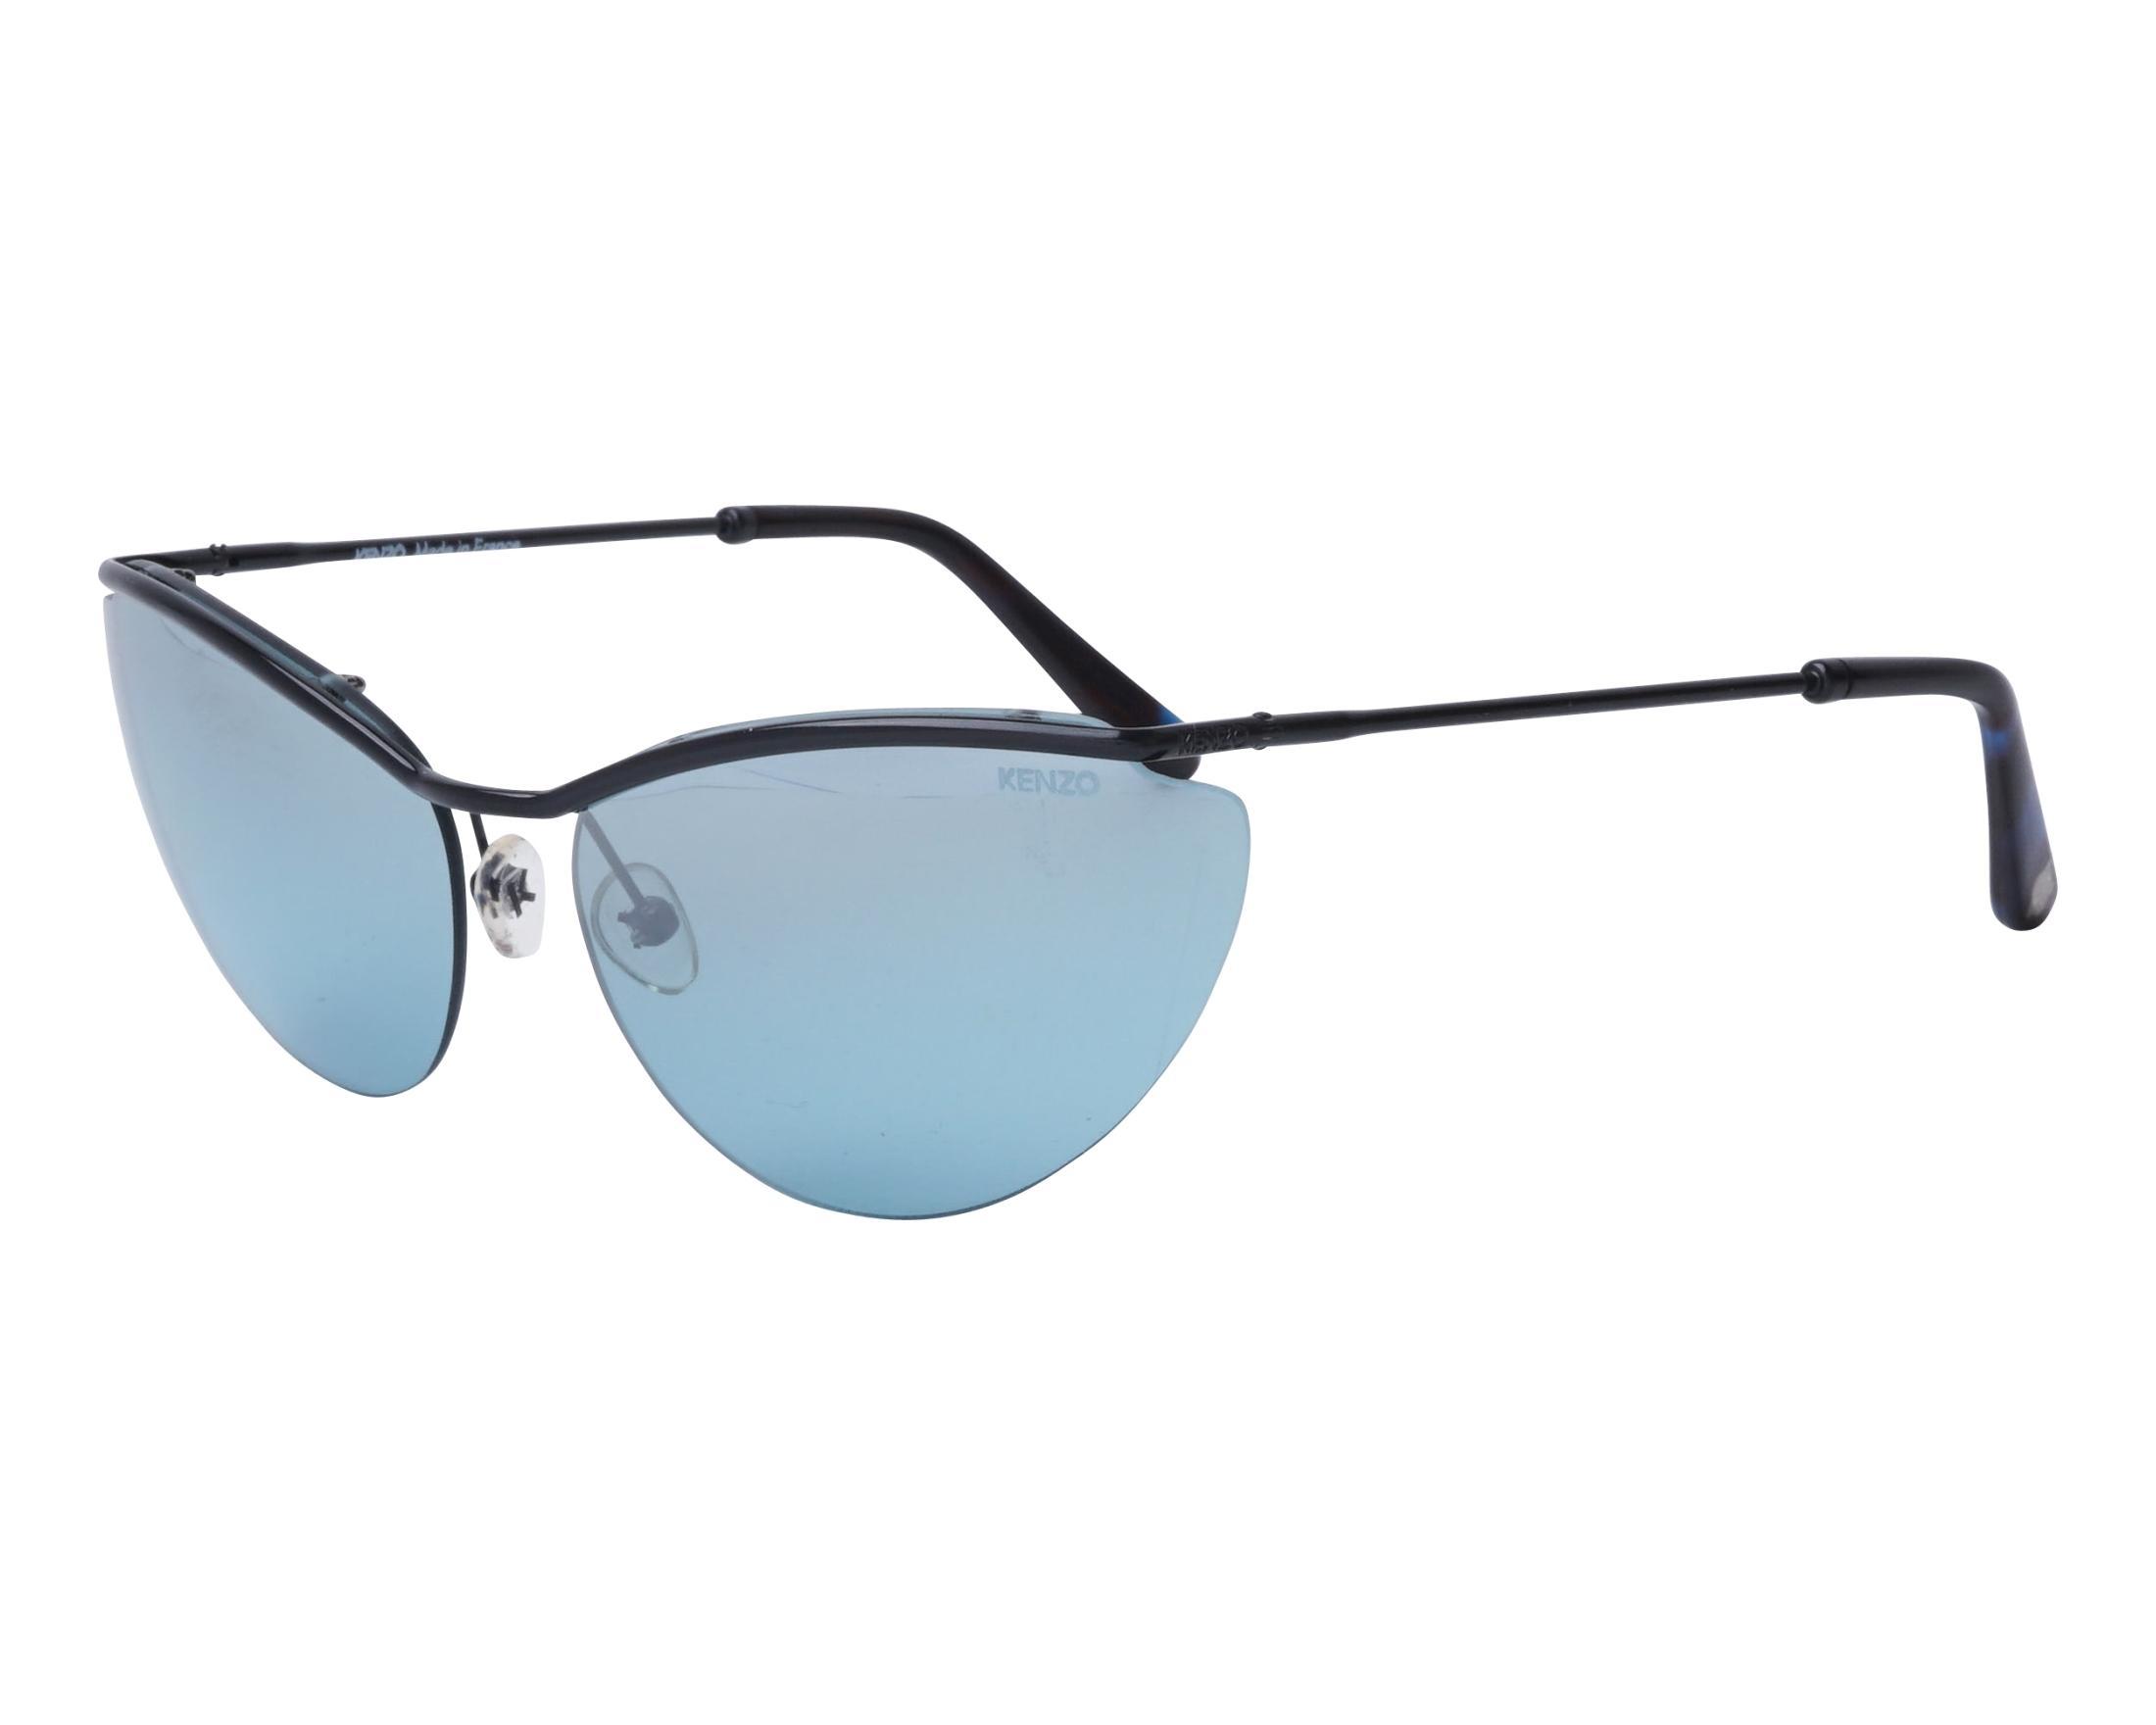 5921b49cae9 Sunglasses Kenzo KZ-3171 C01 61-16 Black profile view